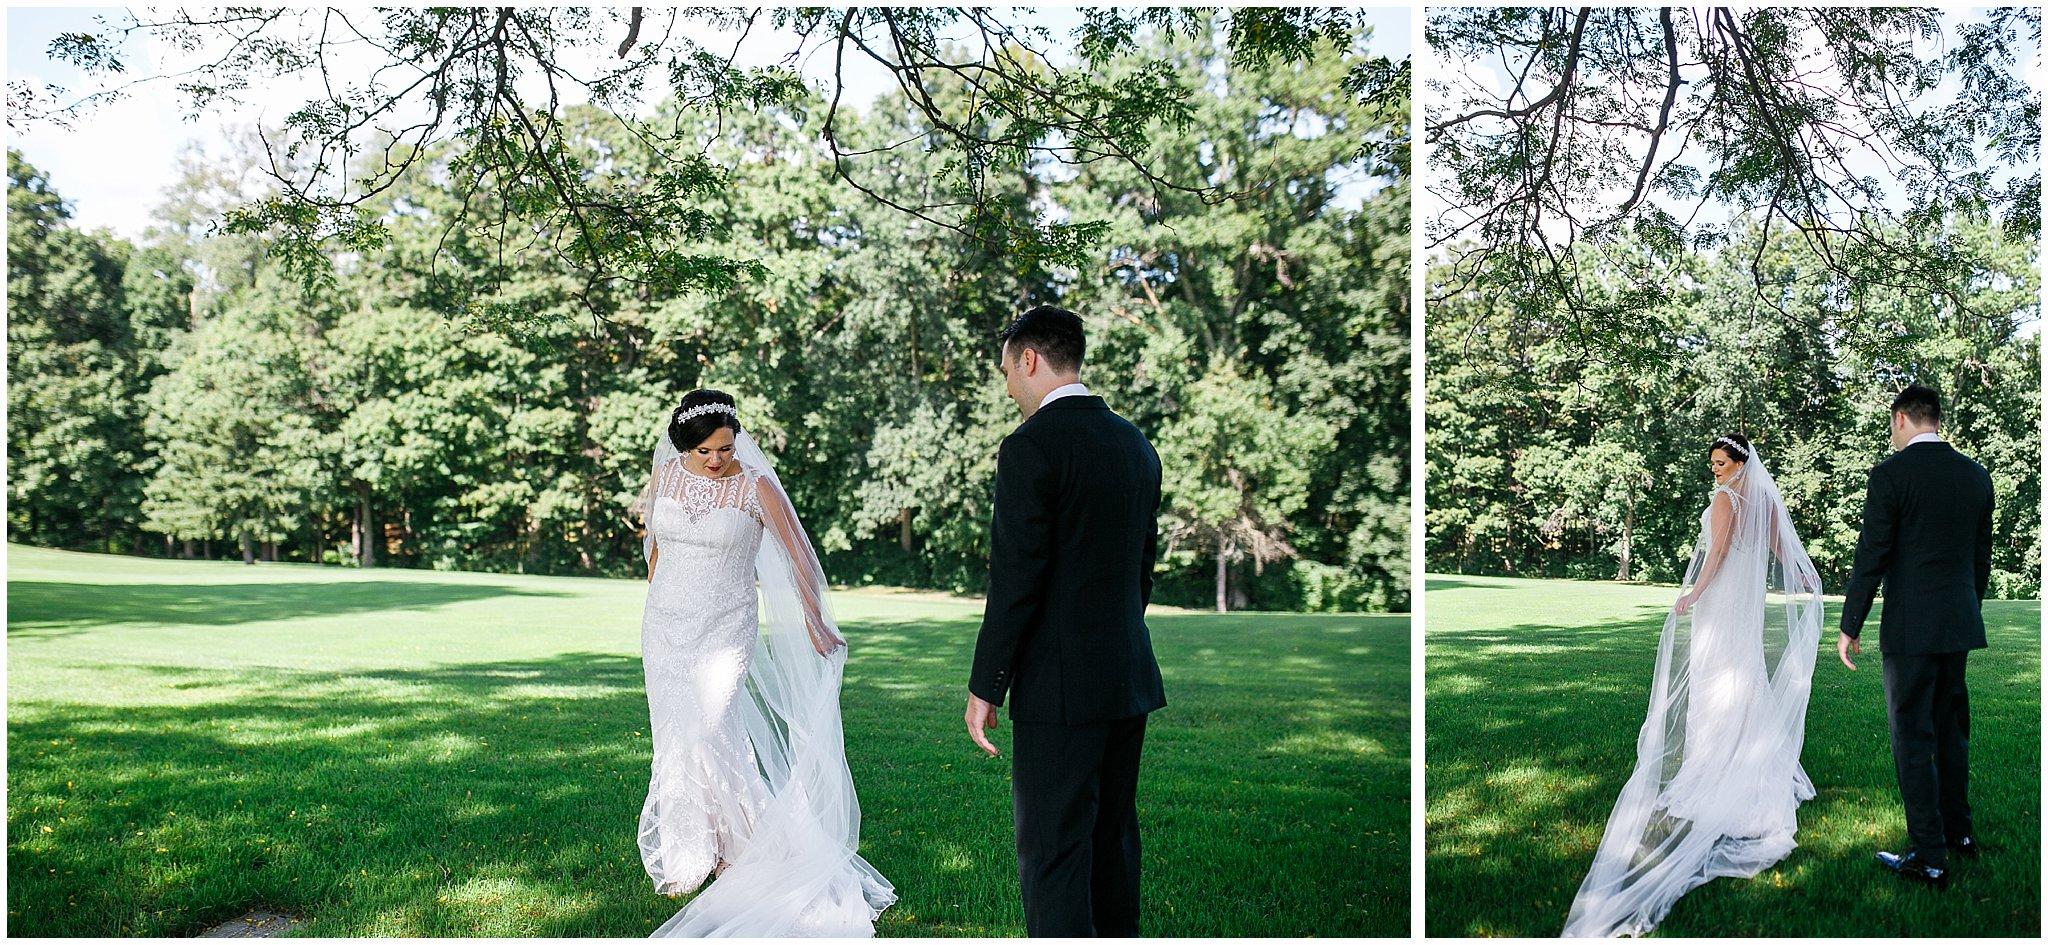 West Hills Country Club Wedding Gatsby Wedding Roaring Twenties Wedding Hudson Valley Wedding Photographer Sweet Alice Photography18.jpg